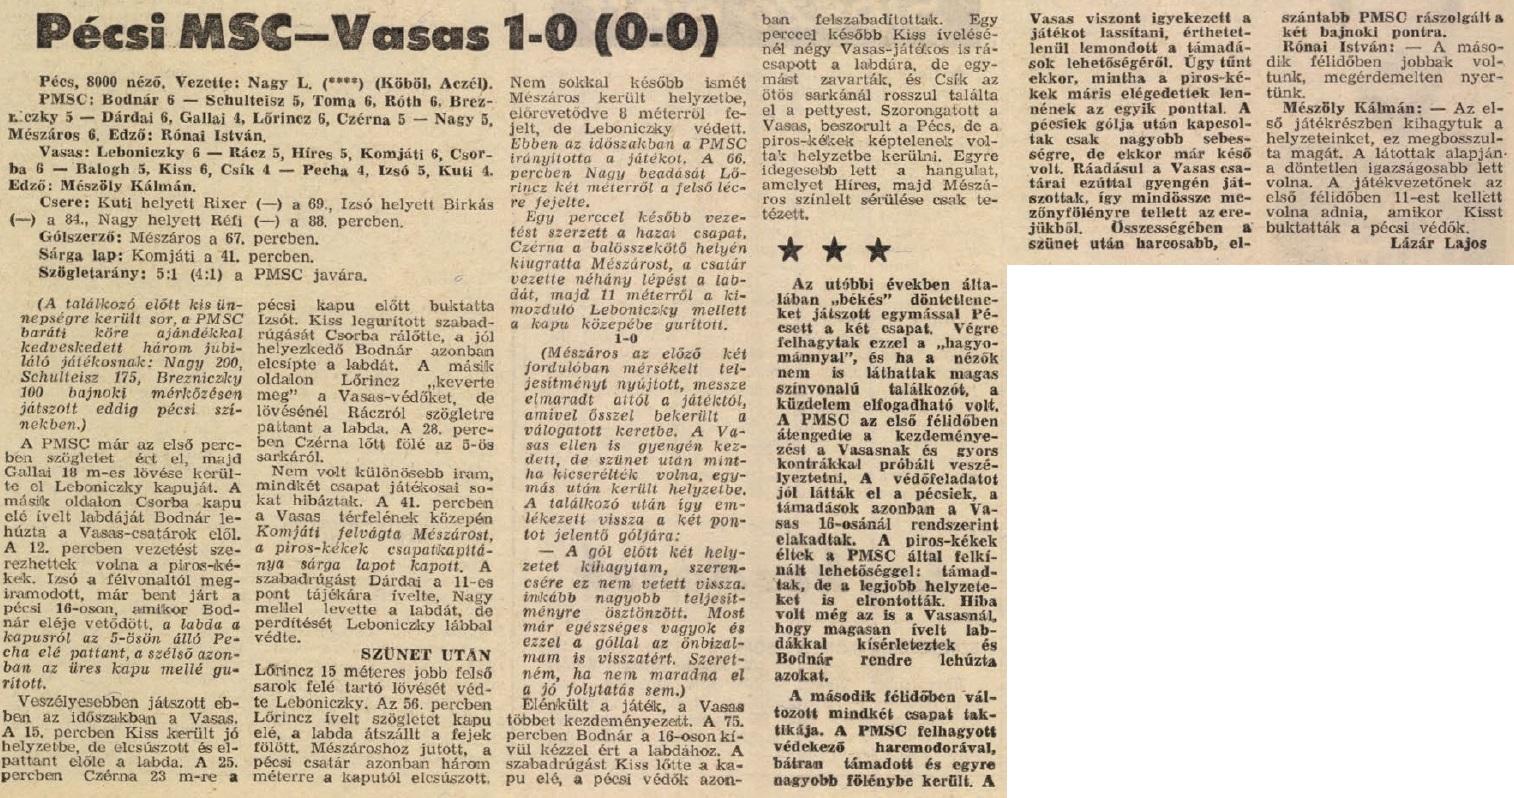 idokapszula_nb_i_1983_84_18_fordulo_pecsi_msc_vasas.jpg